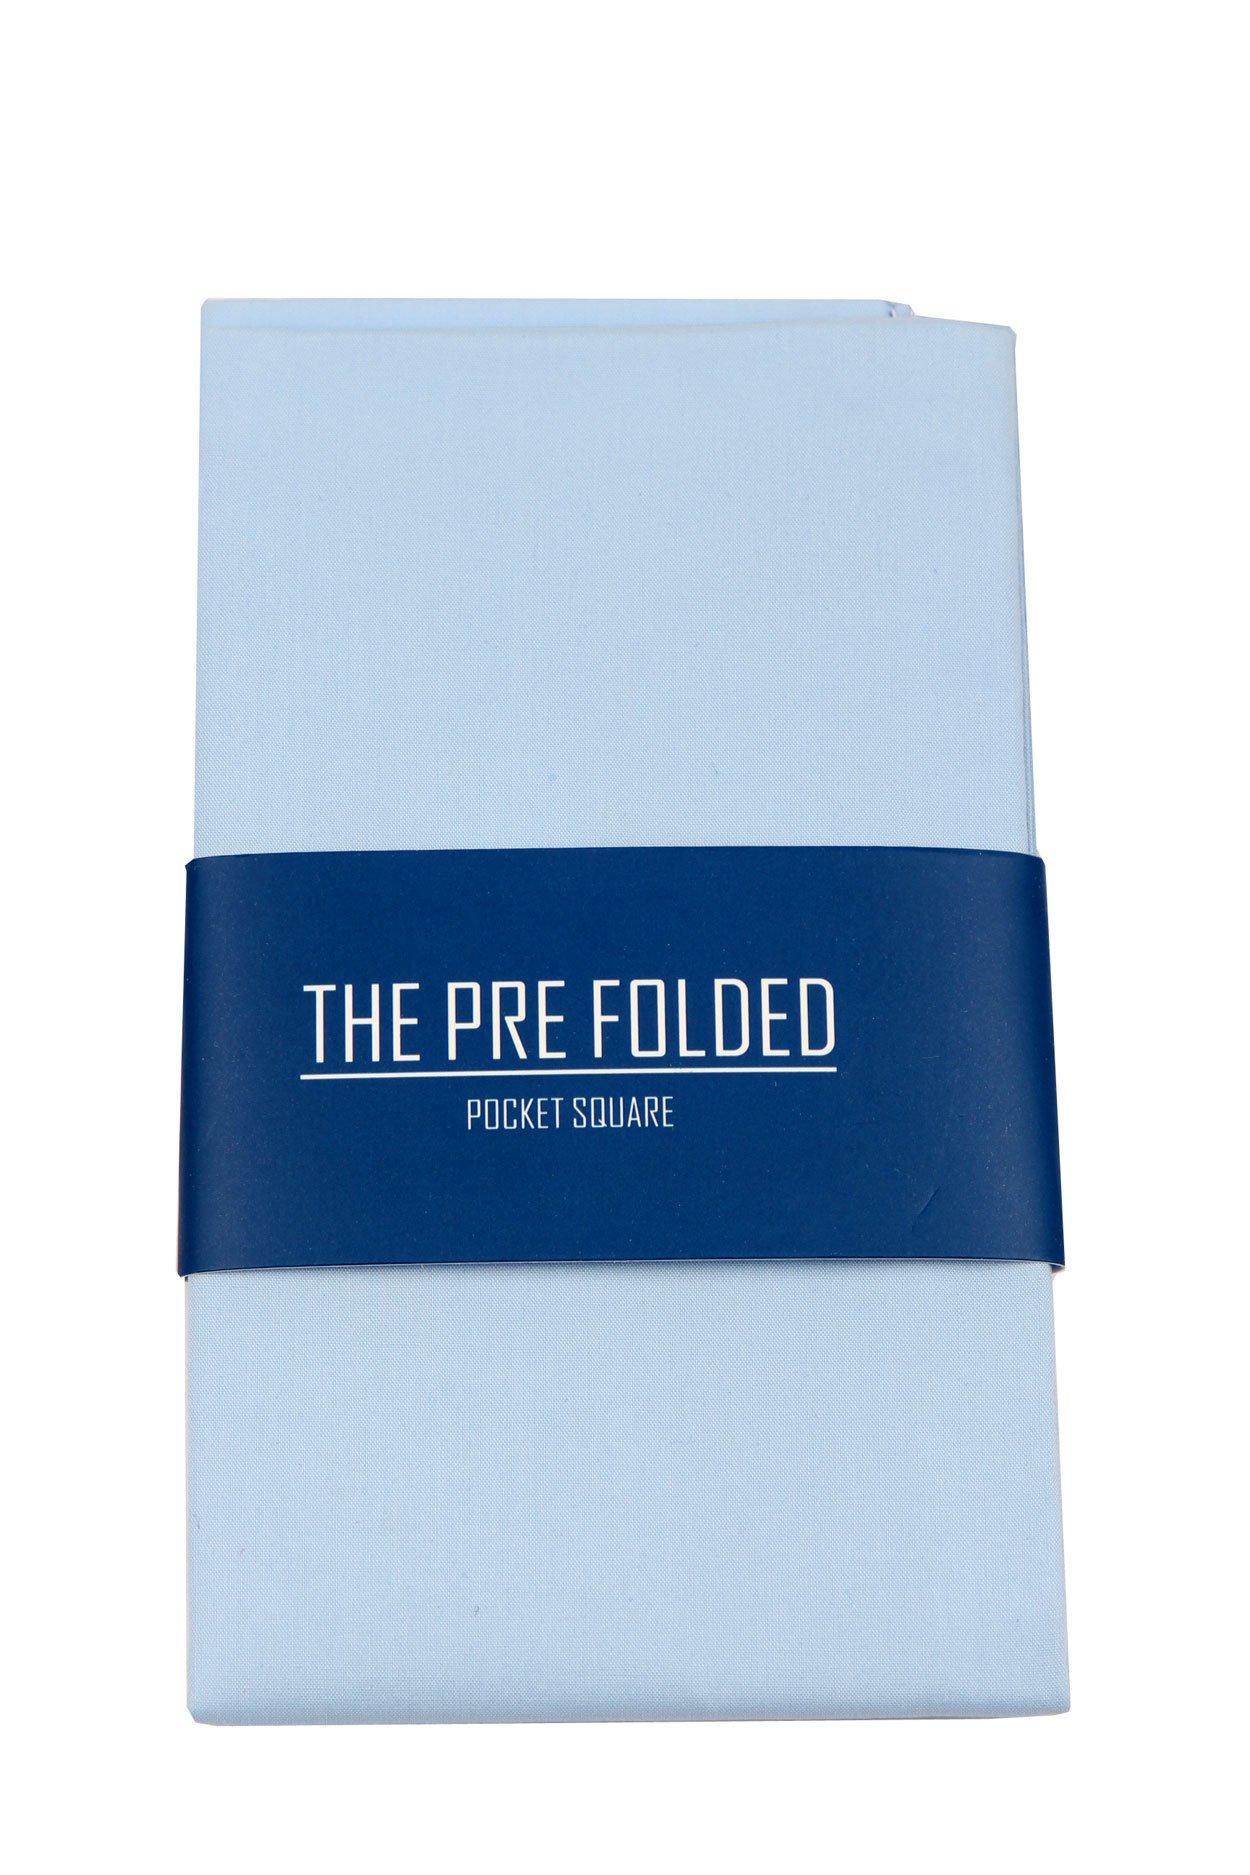 Pre-Folded Fashion Pocket Square Hanky for Men - Solid Dot Paisley Plaid Folded Hankies